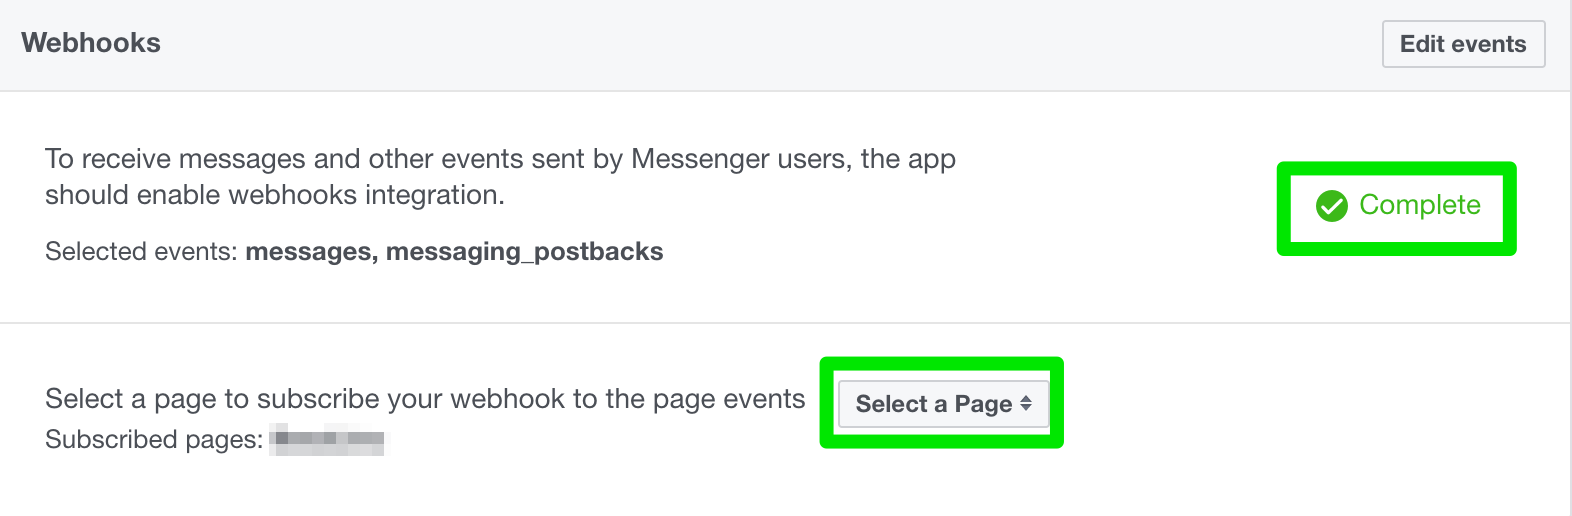 Developing a Facebook Chatbot with AWS Lambda and MongoDB Atlas